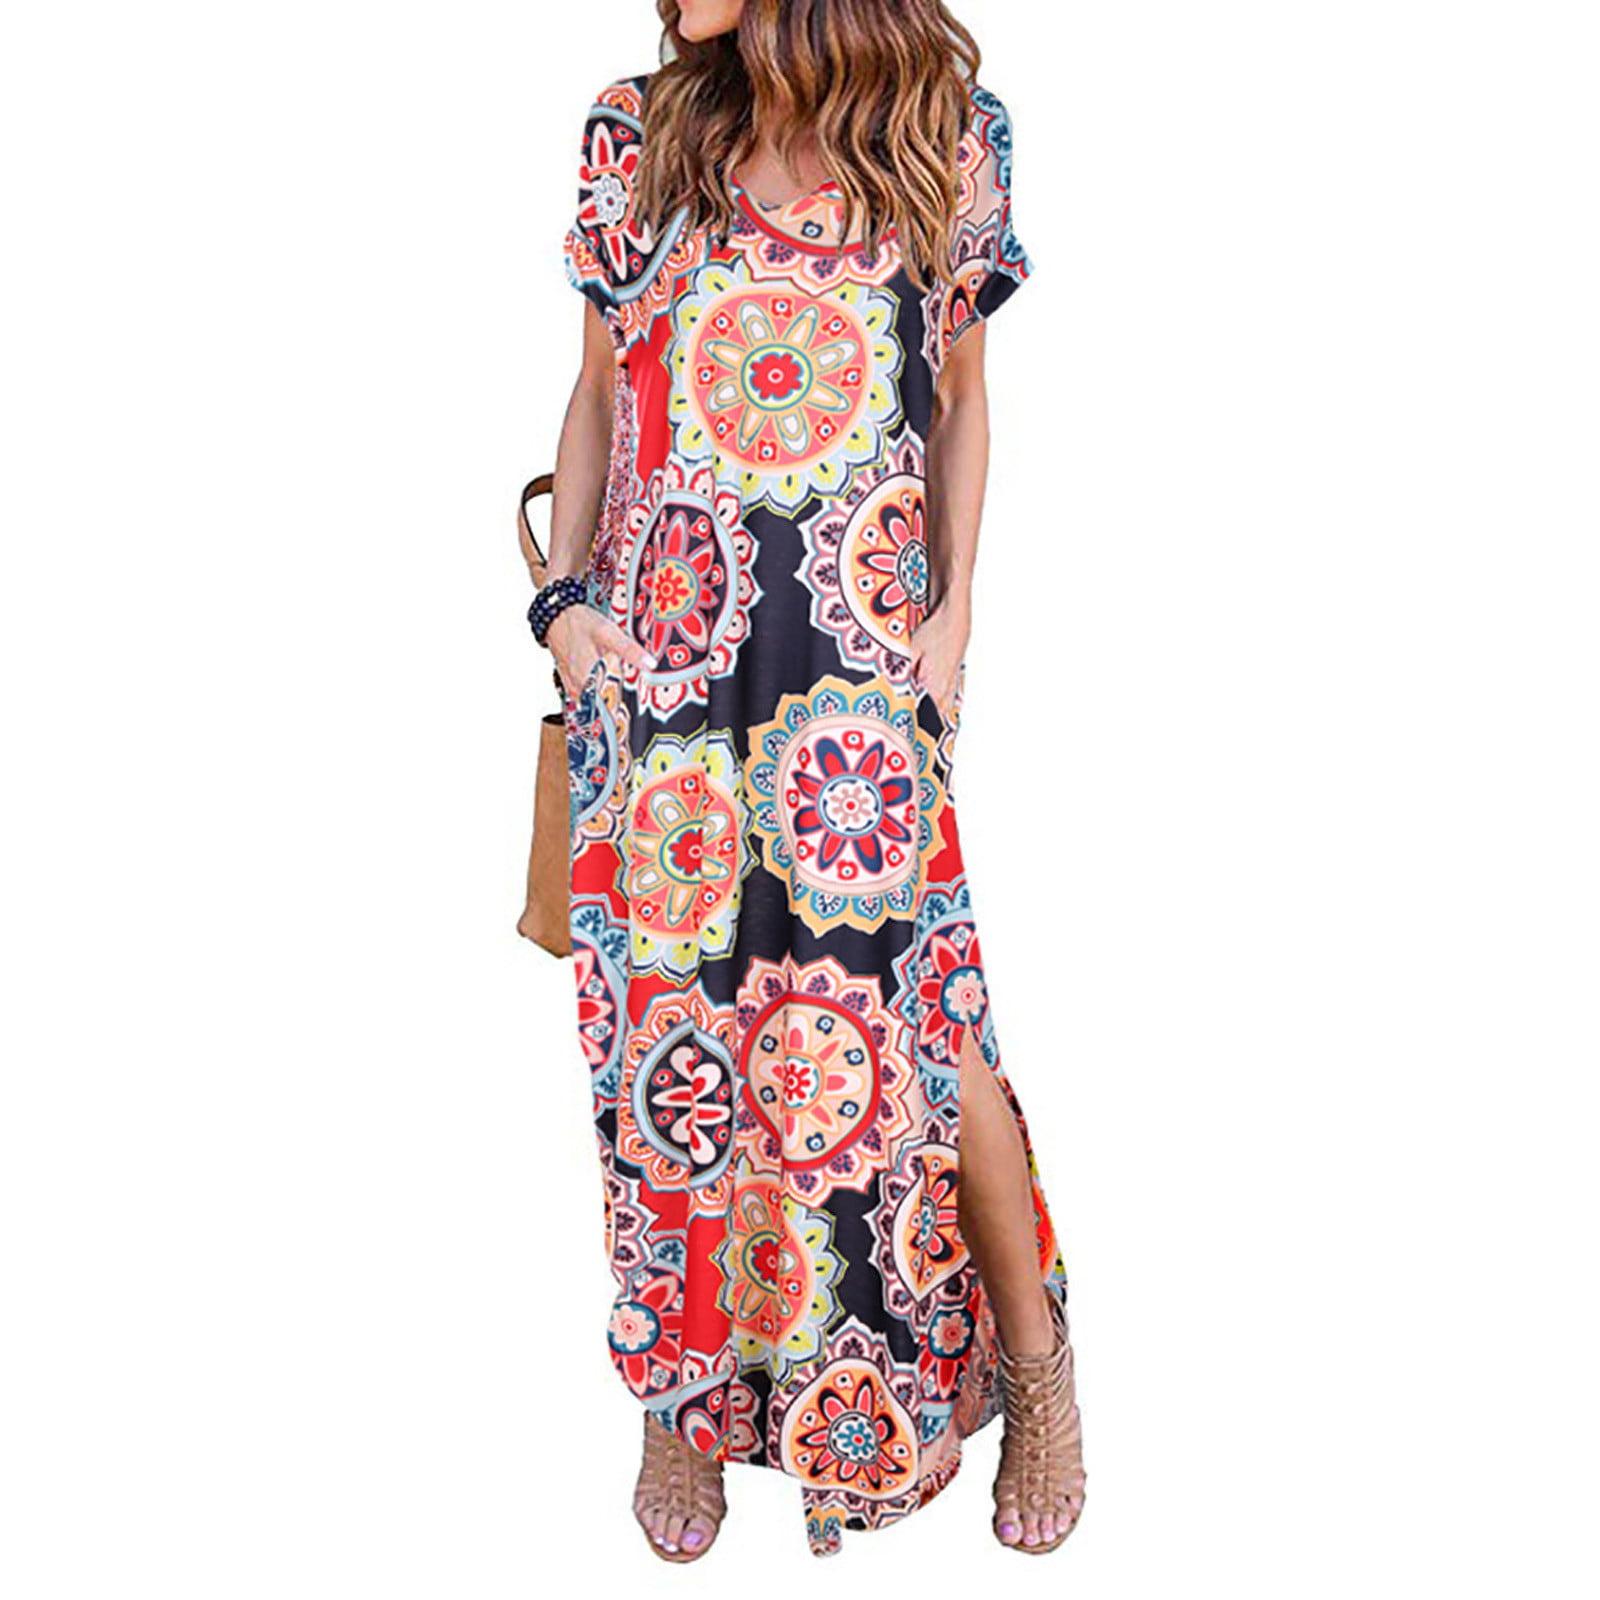 Women Summer Print Dress V-neck Fashion Casual Loose Long Skirt Long Dress